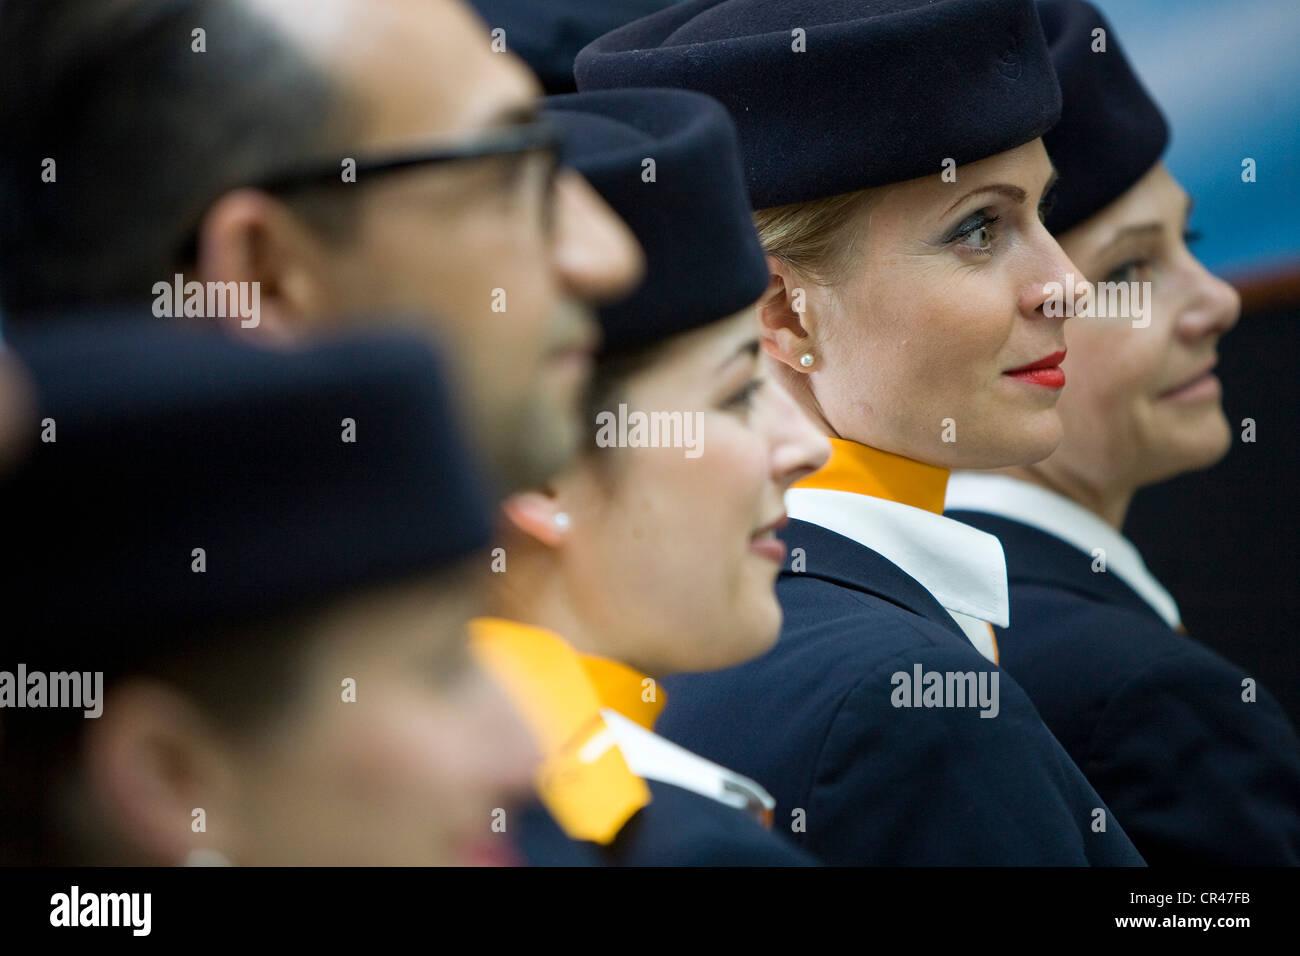 Lufthansa Airlines Flight Attendants.  - Stock Image